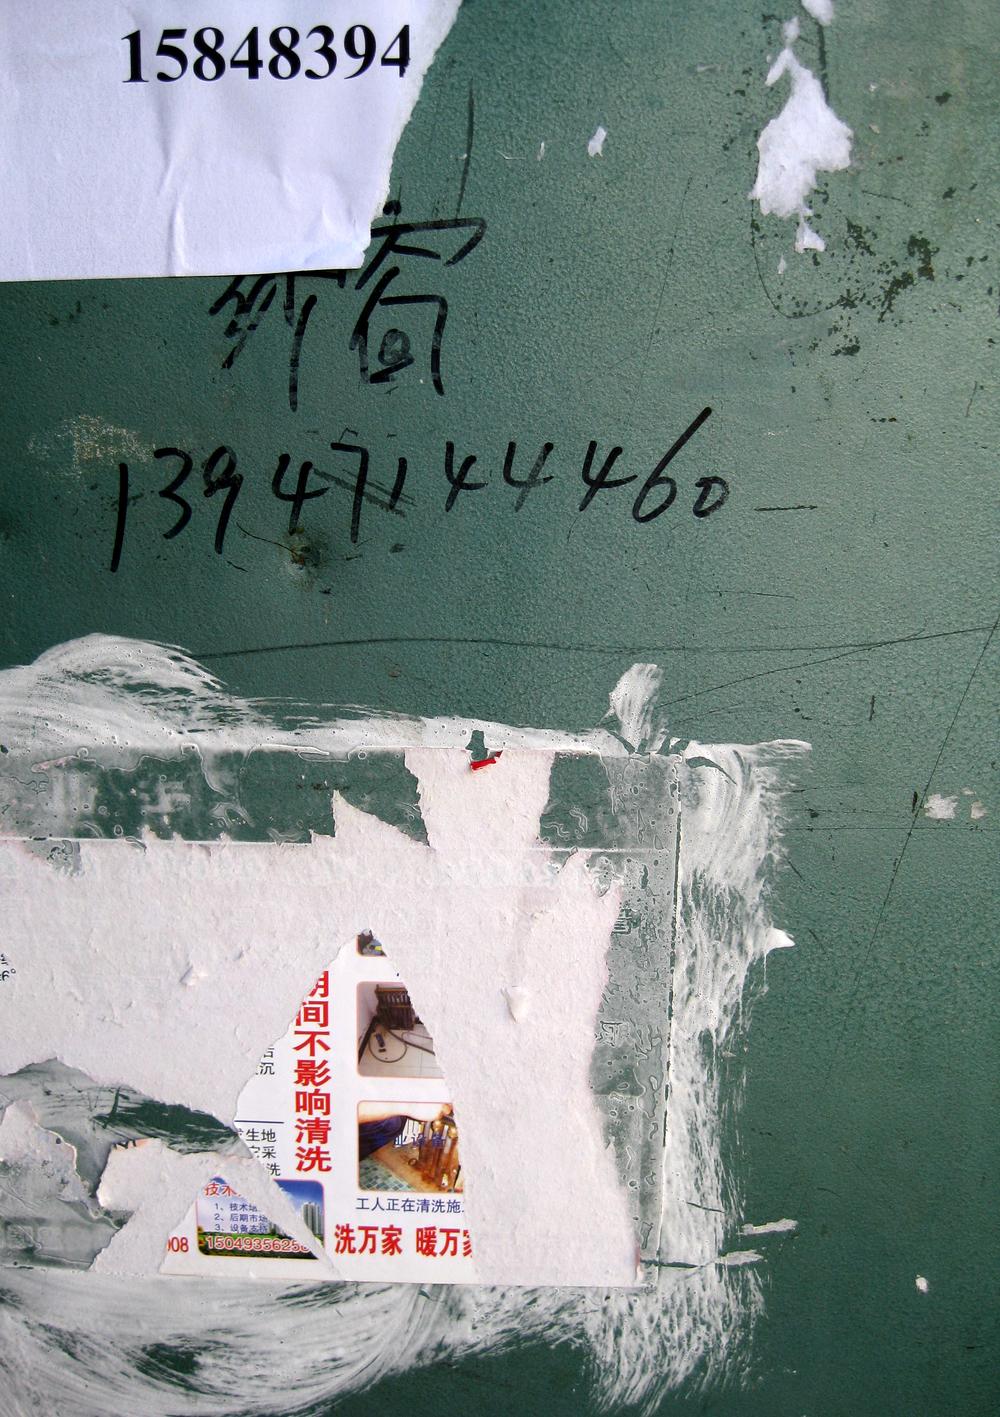 Apartment Building Utility Box V3: Hohhot, China